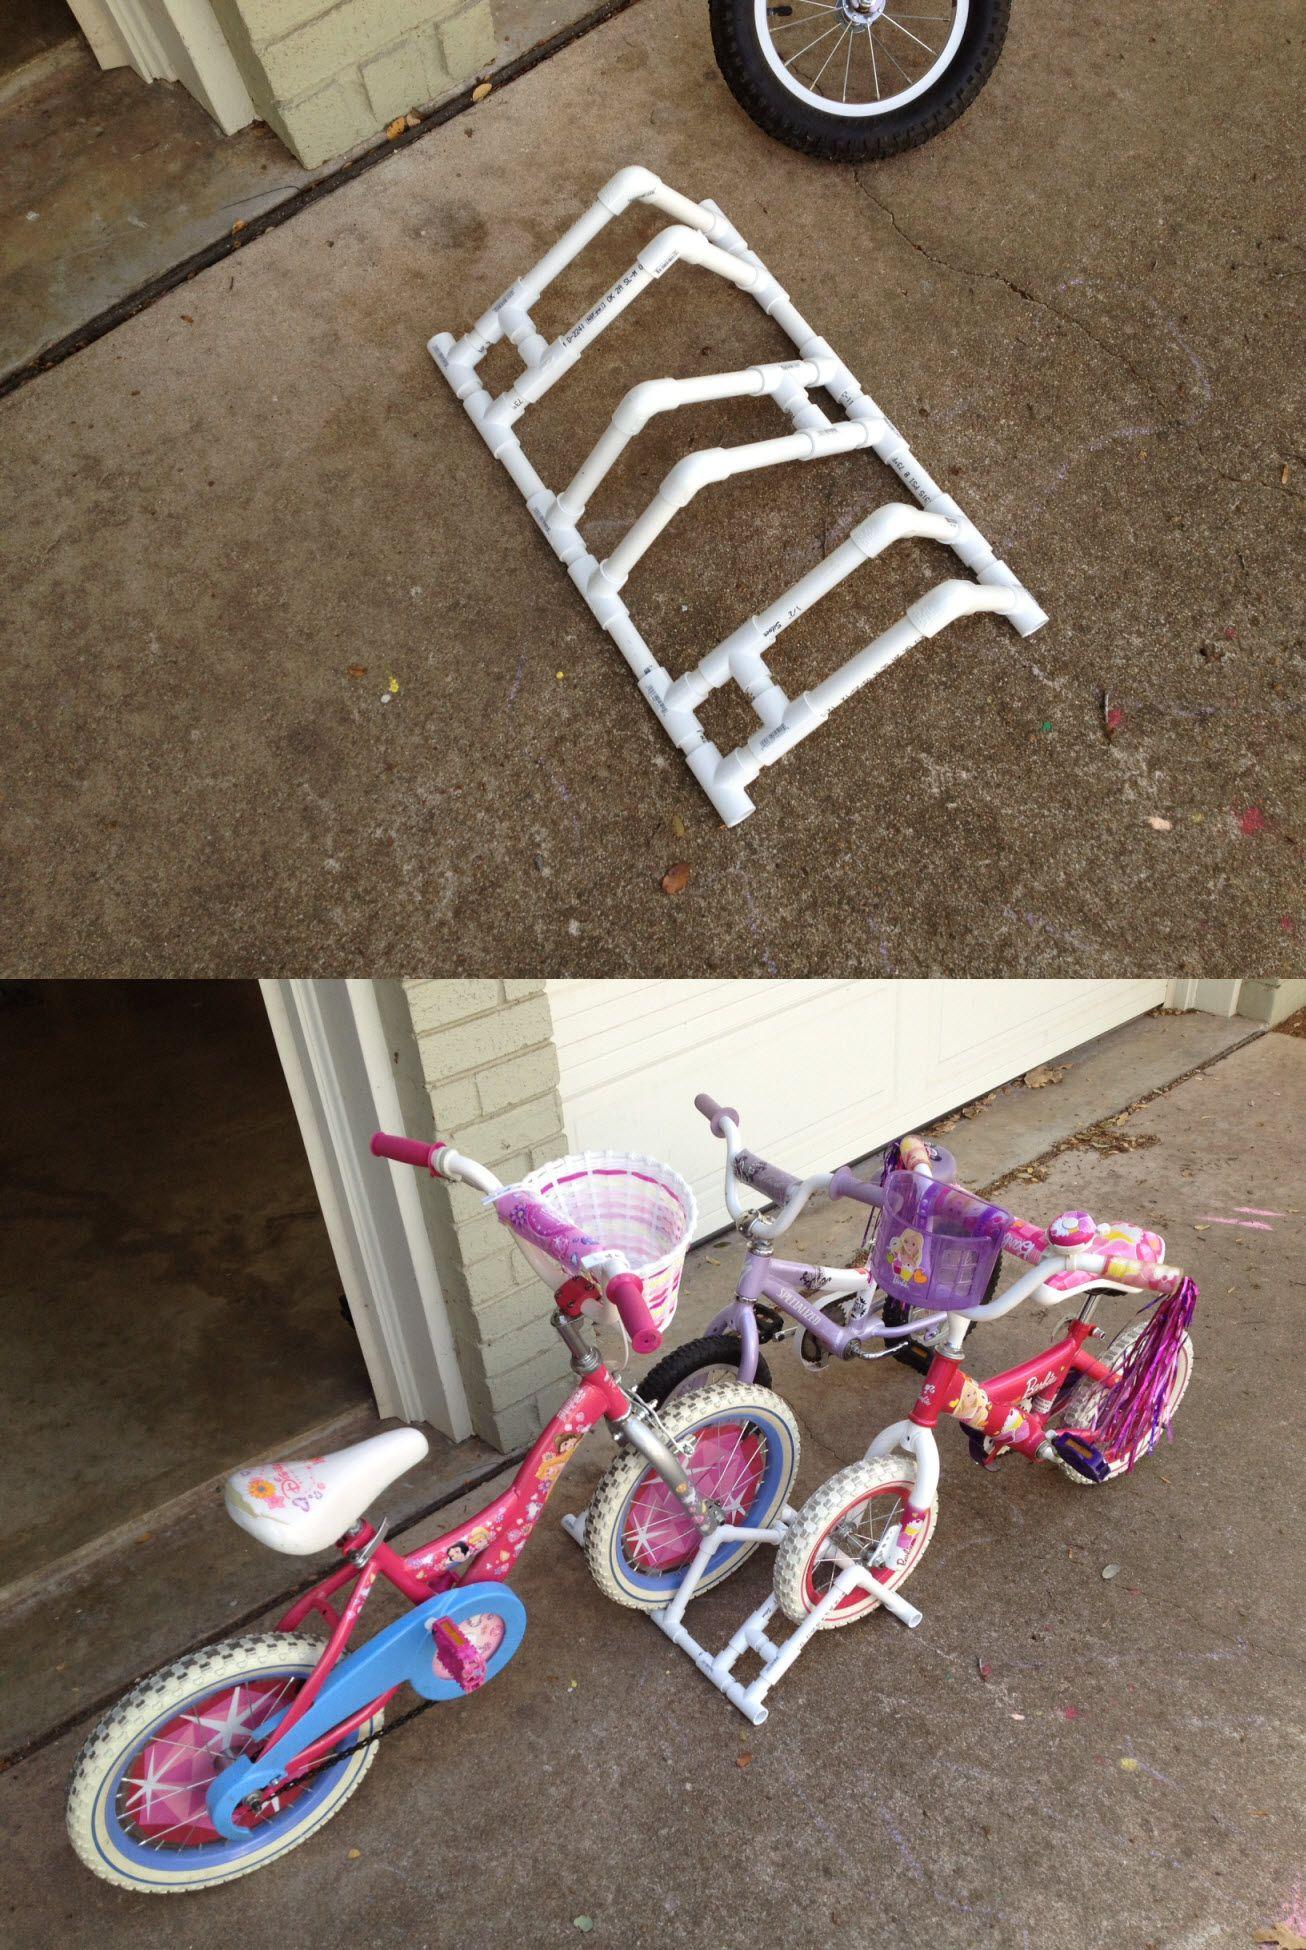 PVC Bike Rack for Kidu0027s bikes (by Dr. ... & PVC Bike Rack for Kidu0027s bikes (by Dr. Lu) | Things for kids ...